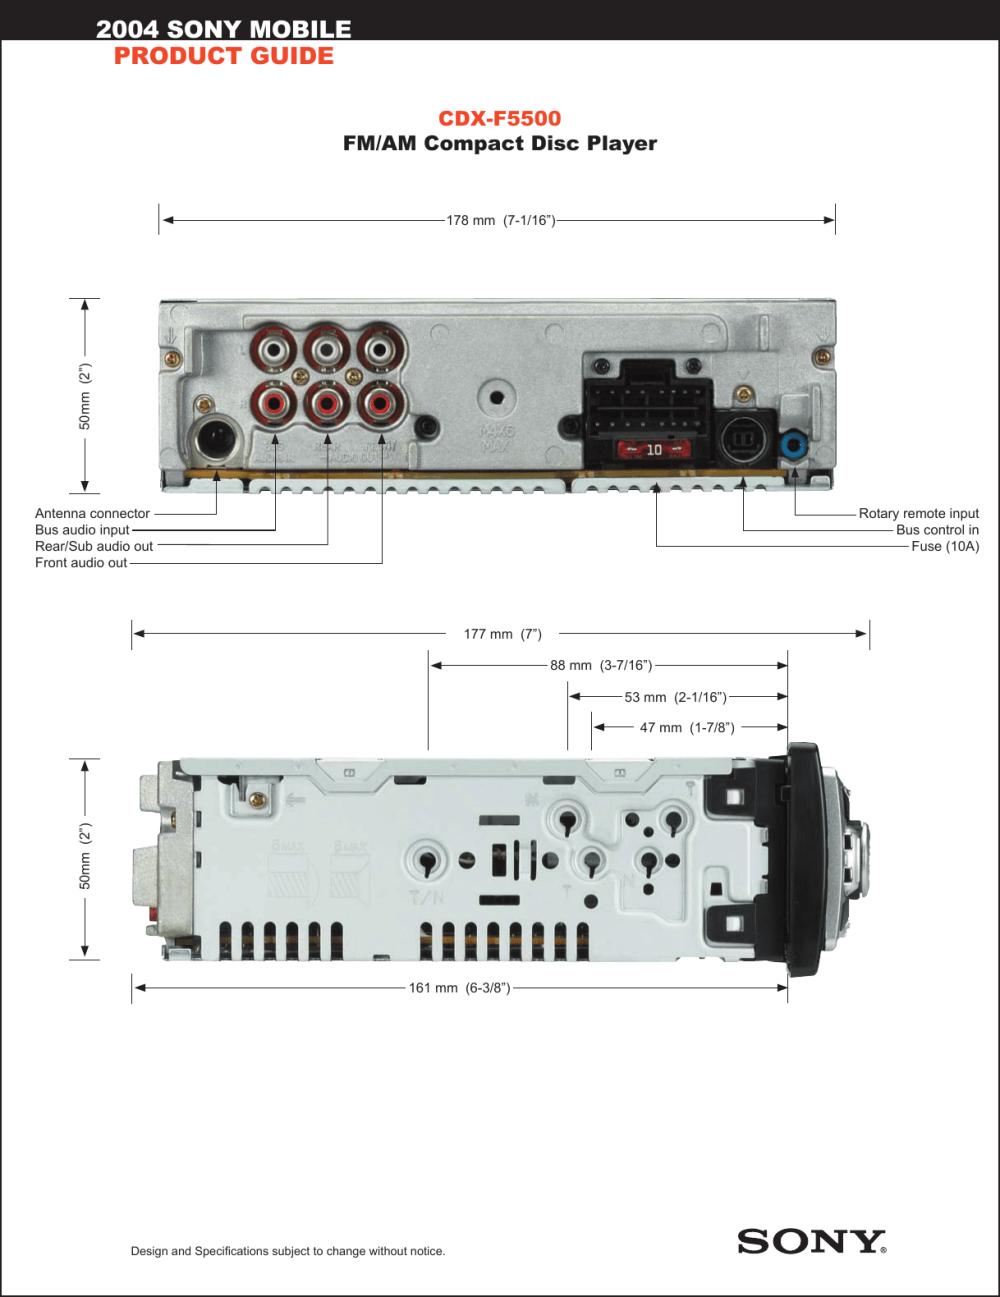 medium resolution of sony cdx f5500 marketing specifications sony m 610 wiring harness diagram sony cdx f5500 wiring diagram